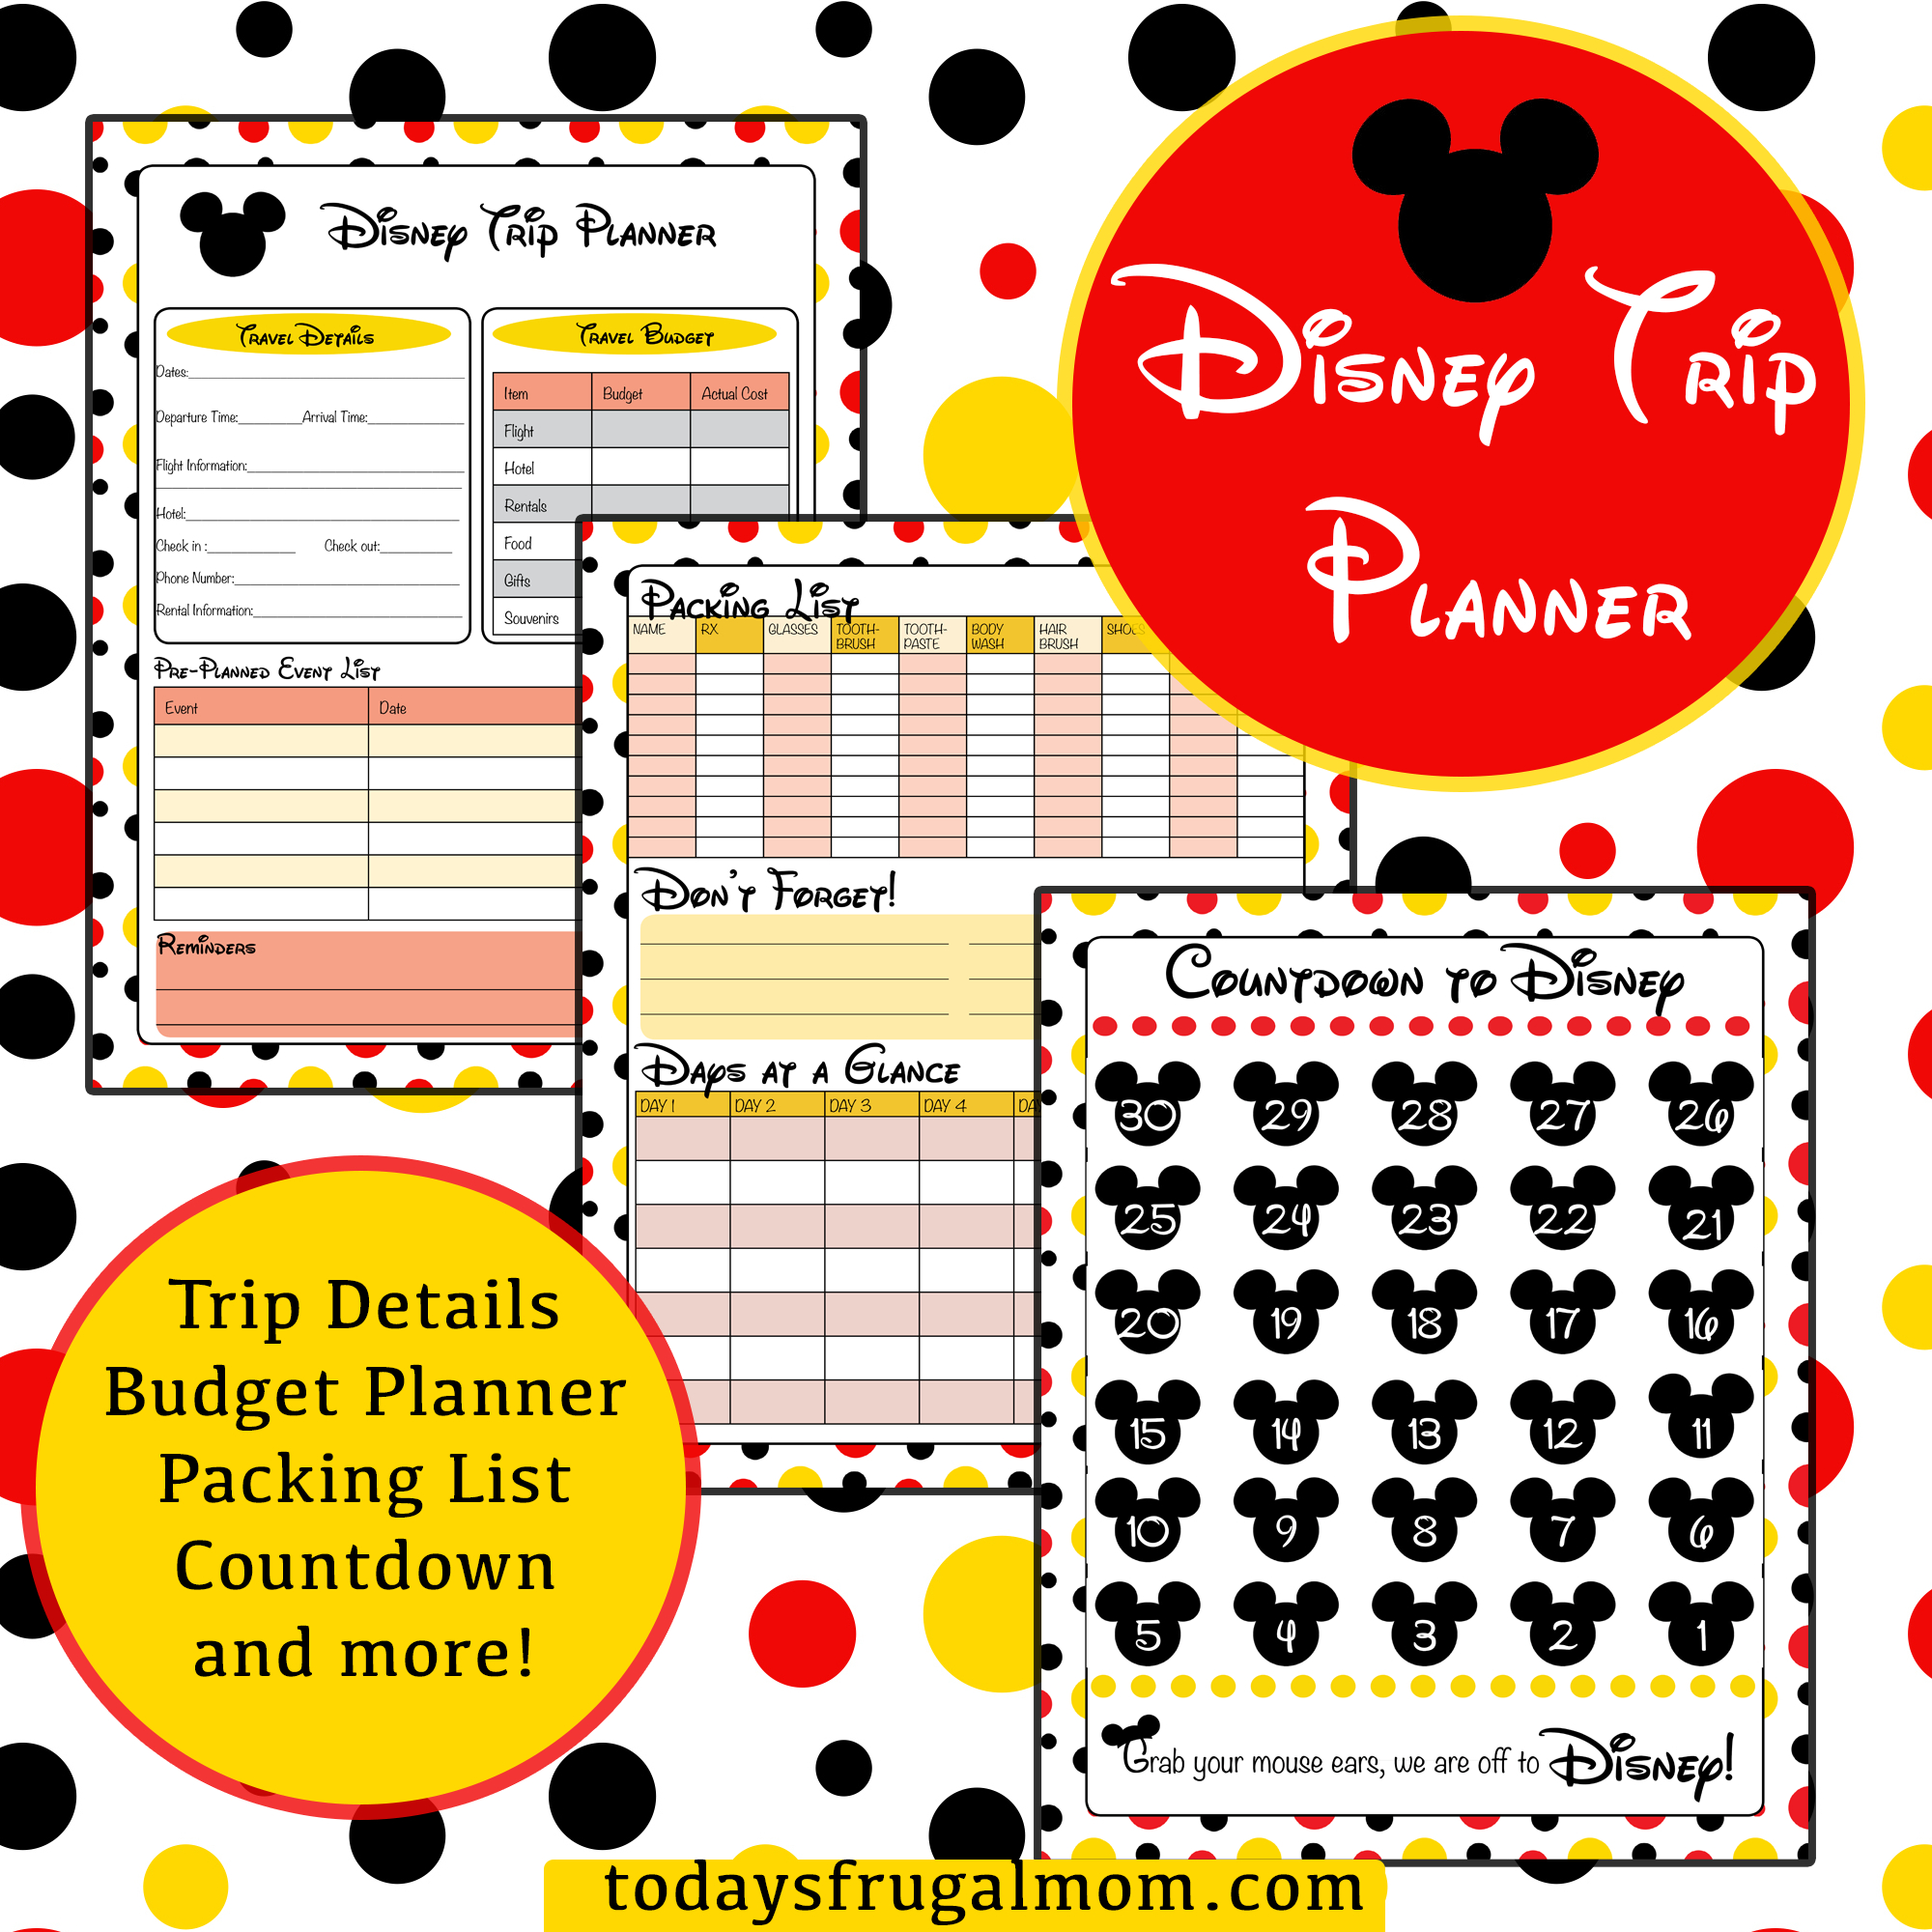 Printable Disney Trip Planner | Places To Go | Disney World Vacation - Free Disney Planning Binder Printables